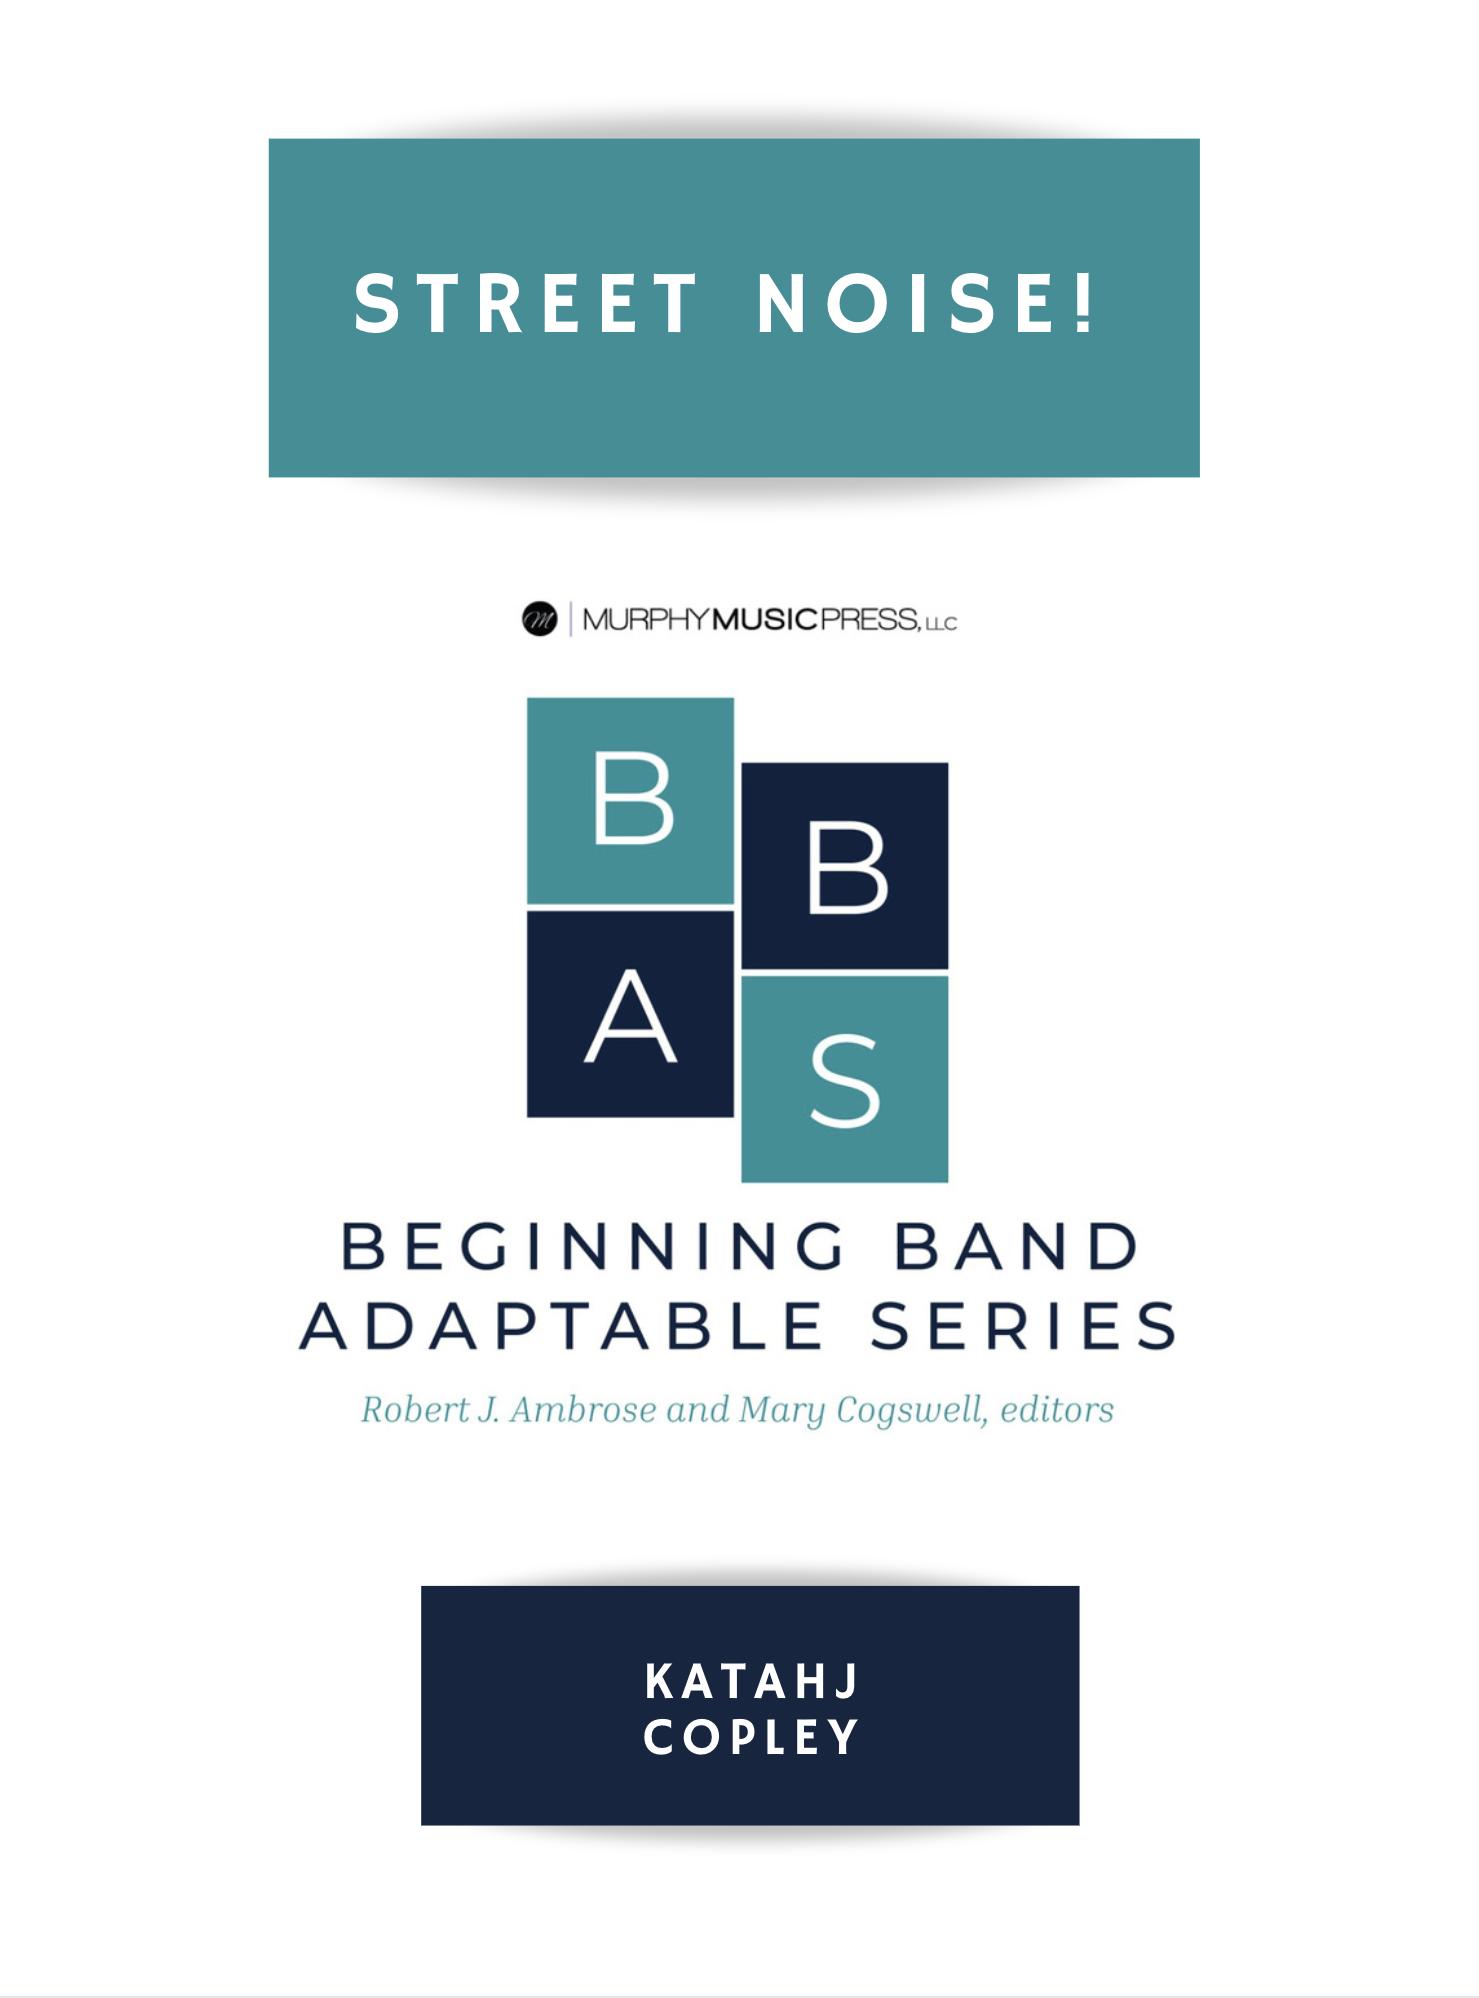 Street Noise! by Katahj Copley